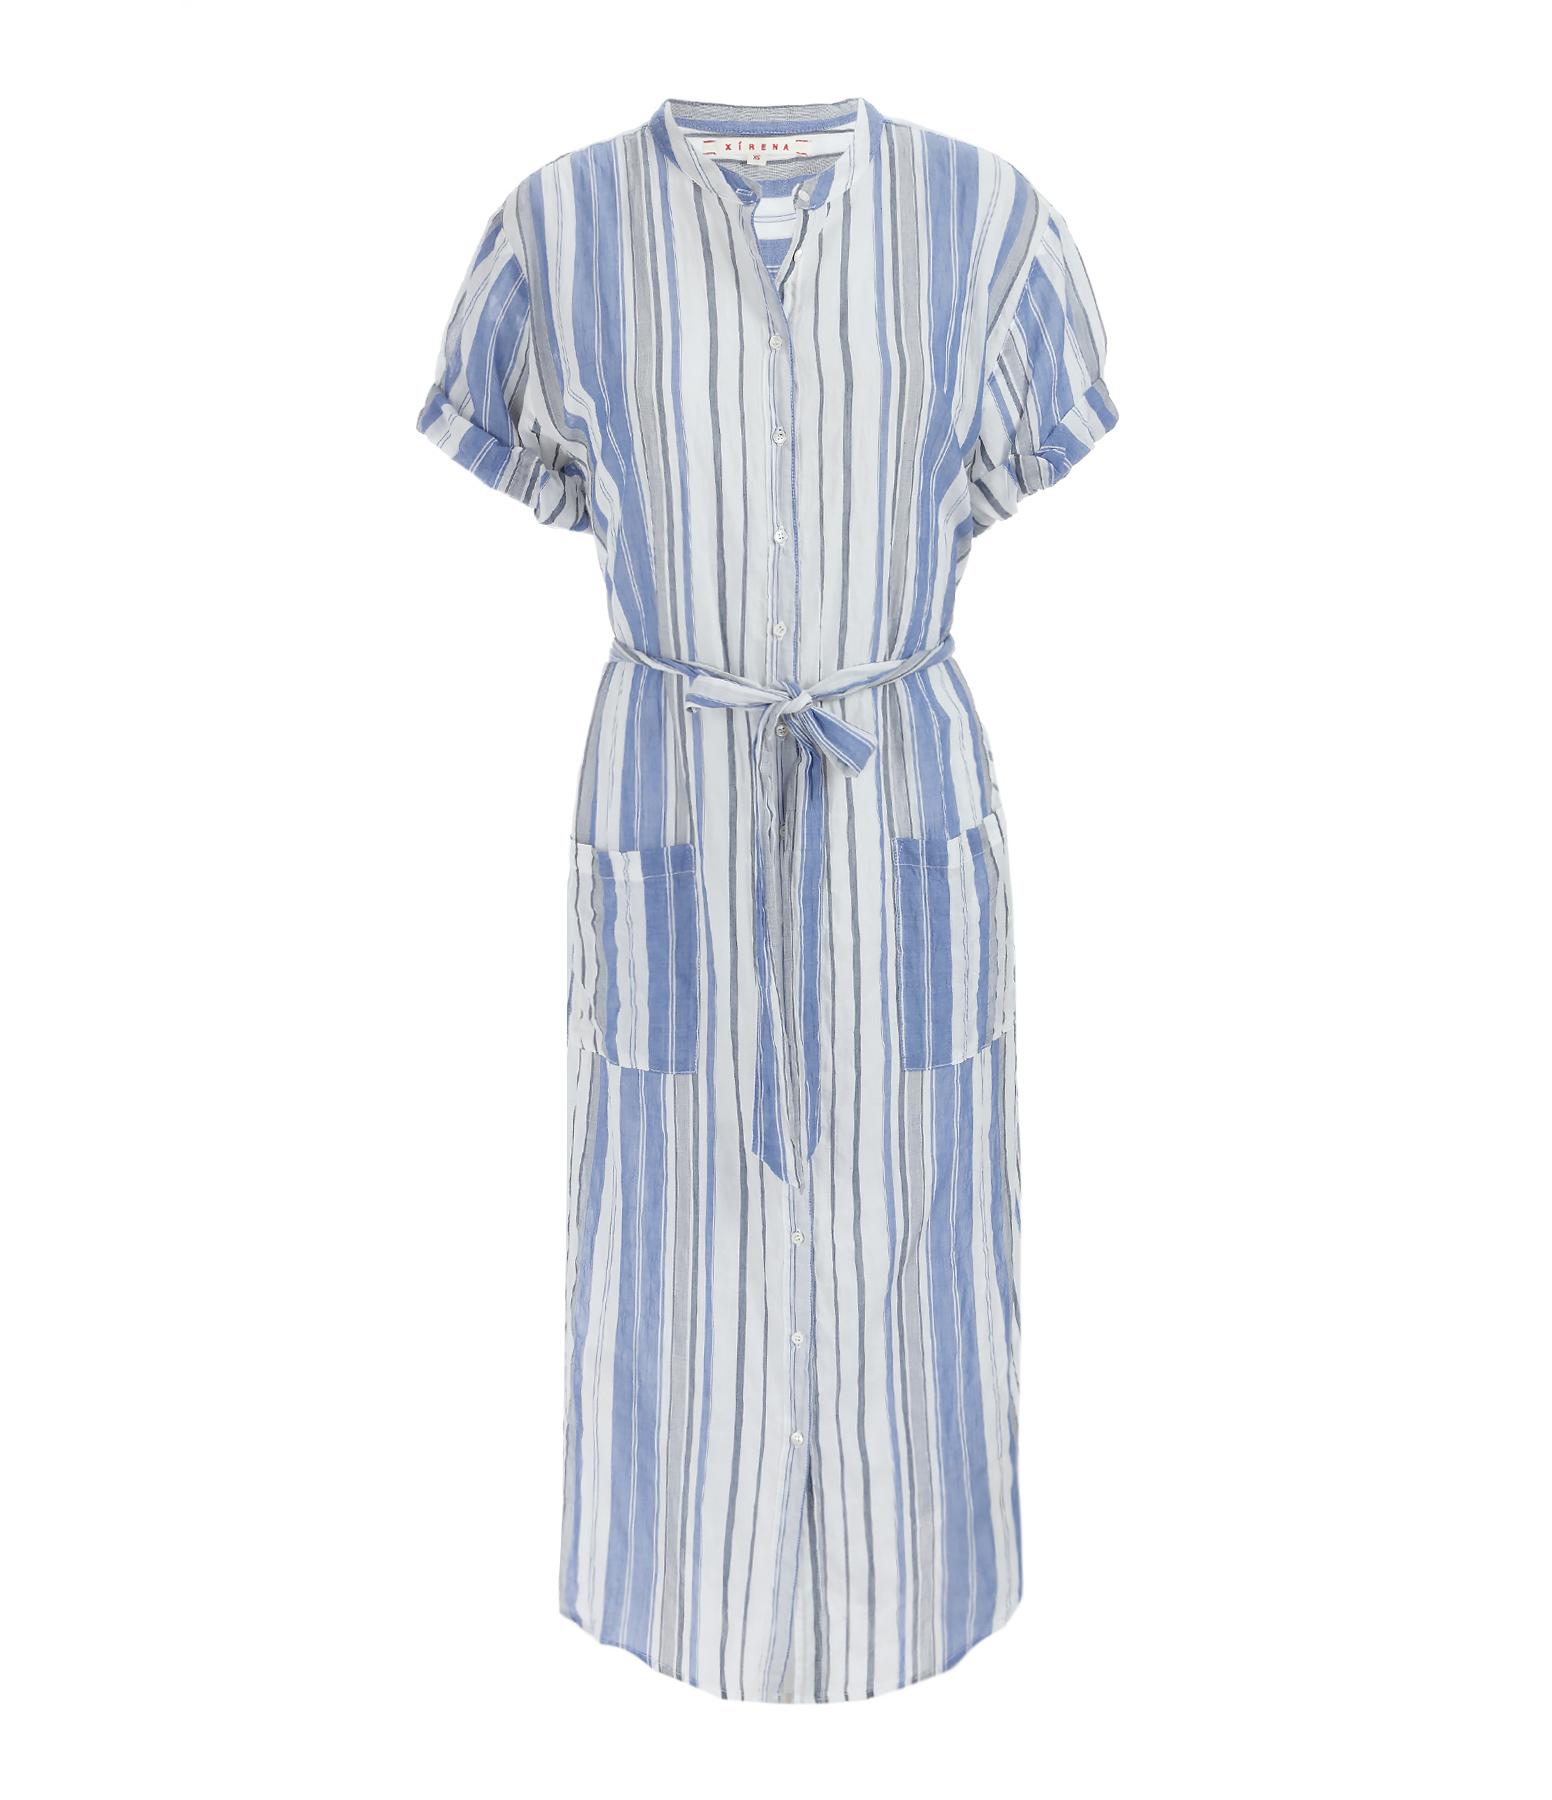 Robe Chemise Mixed Striped Alexa Coton Sotto